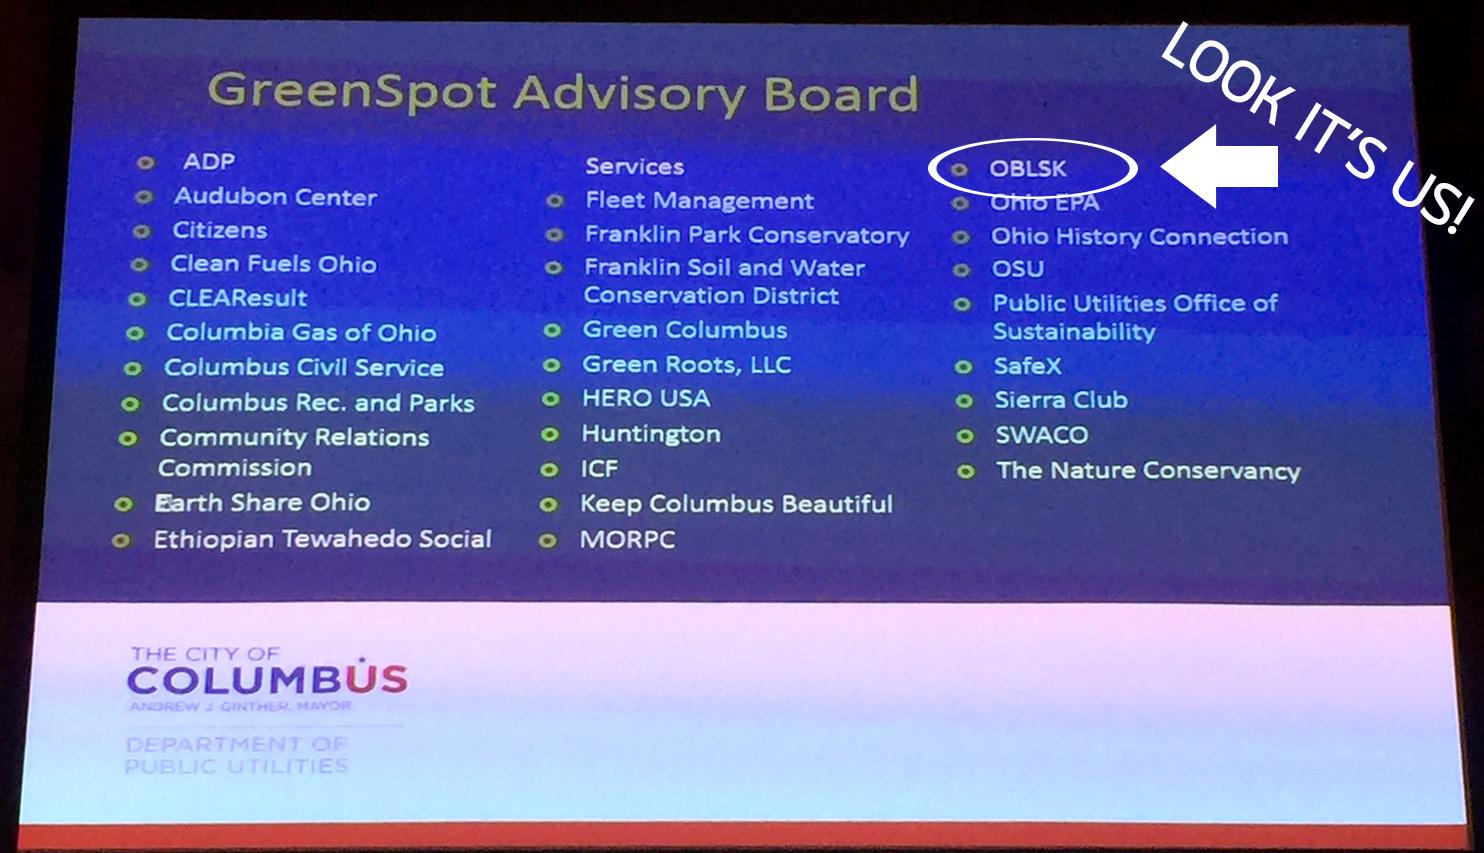 GS_AdversoryBoard.jpg